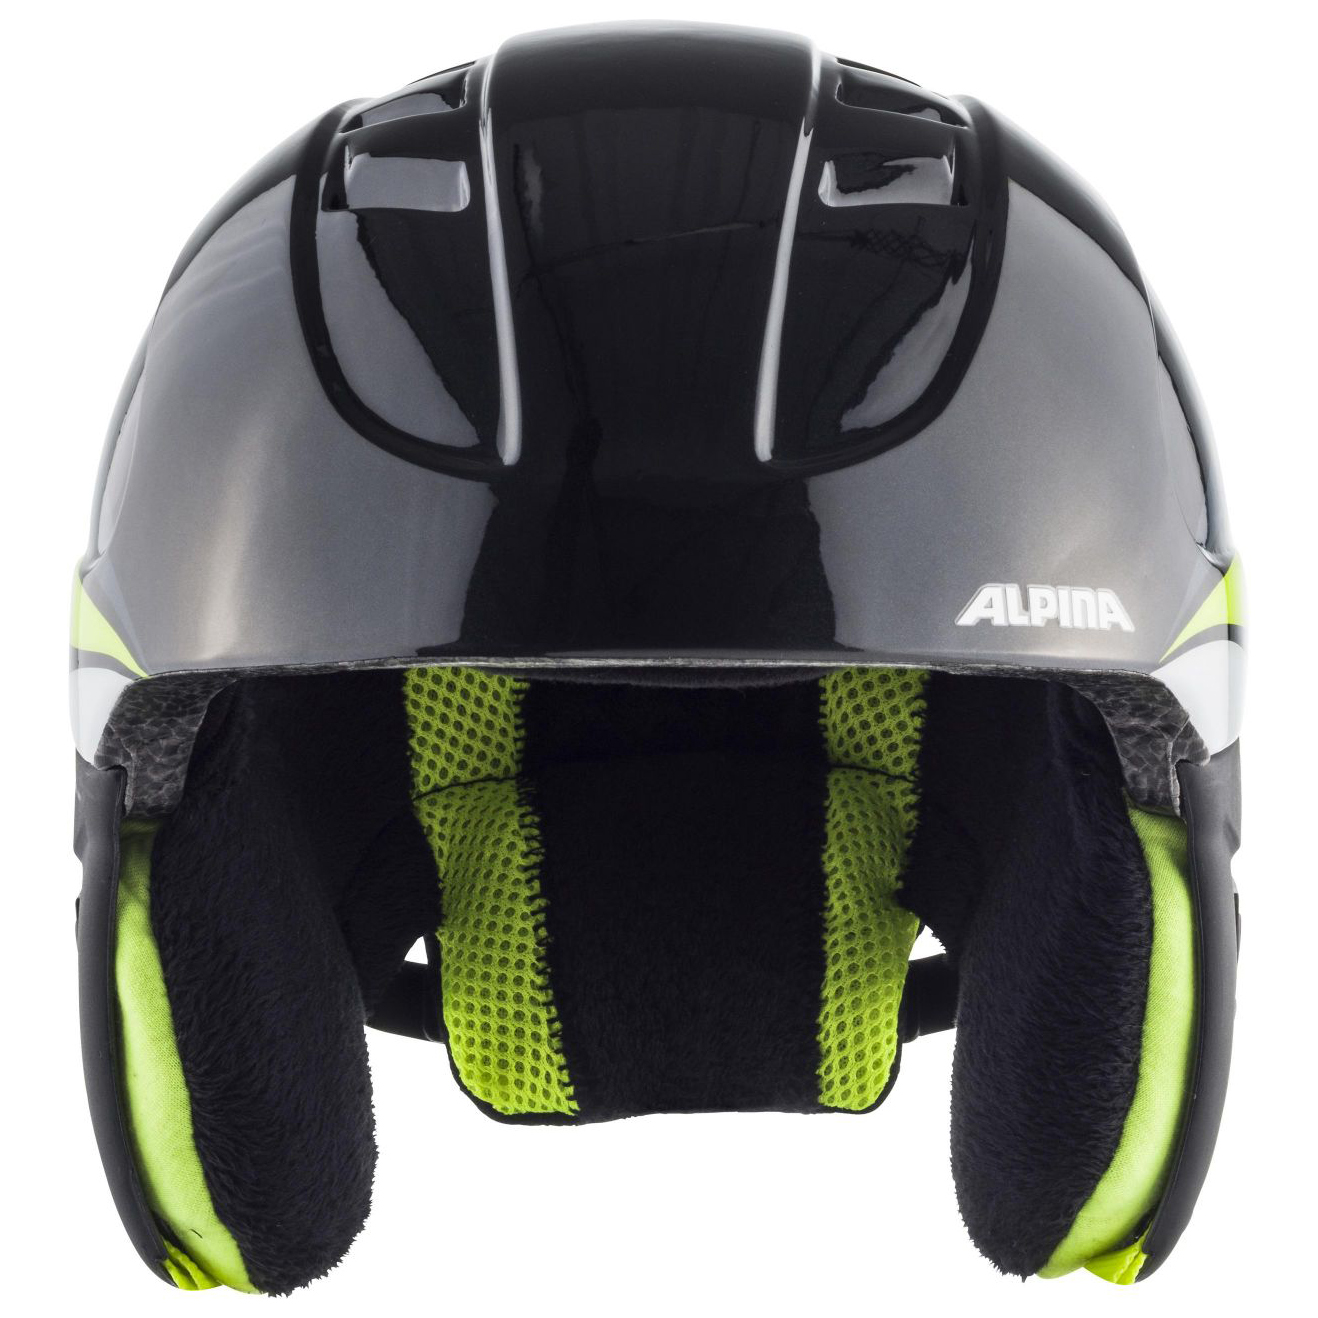 Alpina Carat Visor Ski Helmet Kids Free EU Delivery Bergfreundeeu - Alpina helmets